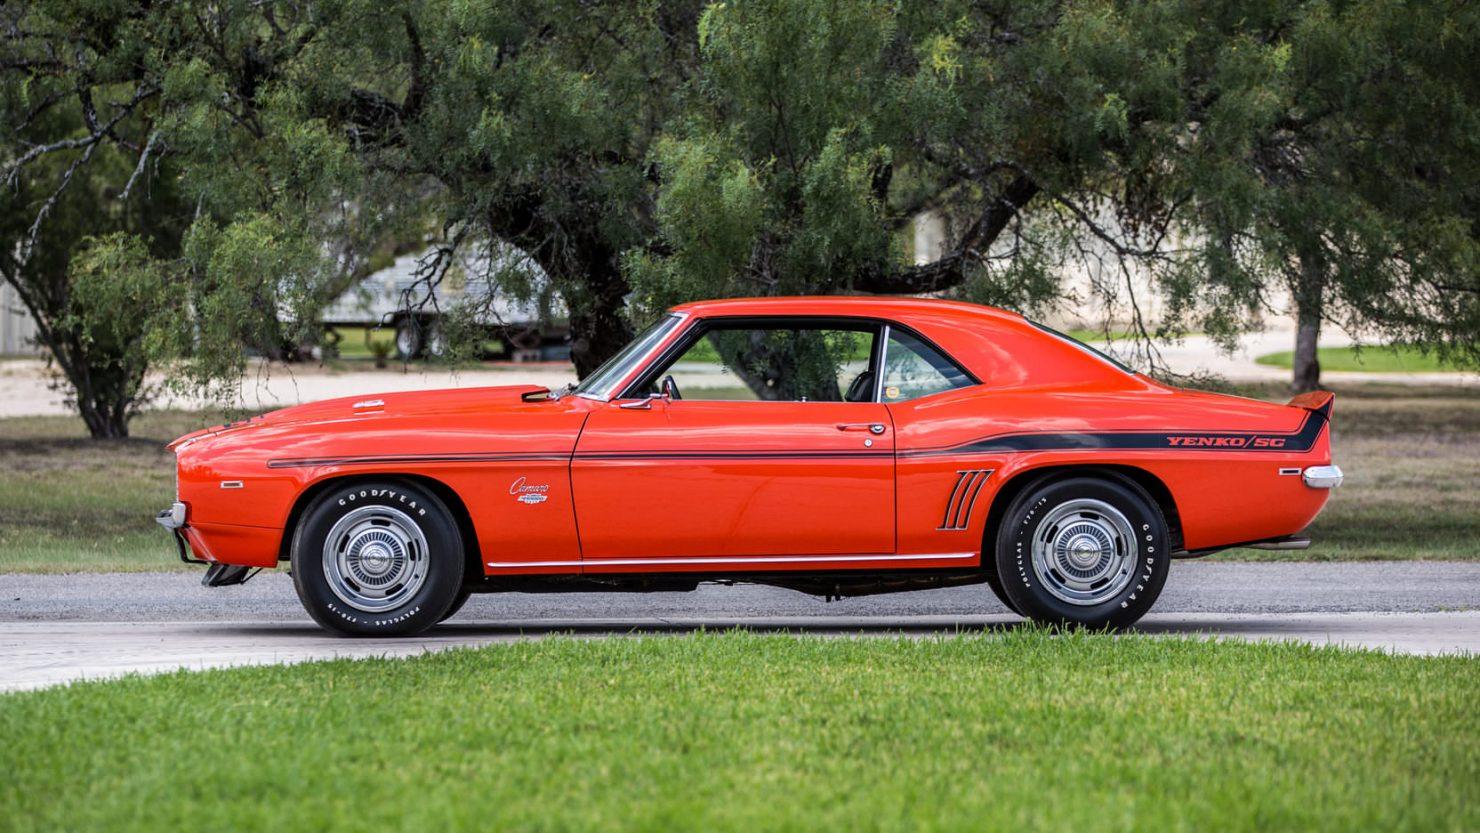 Chevrolet Yenko Camaro 6 1480x833 - 1969 Chevrolet Yenko Camaro